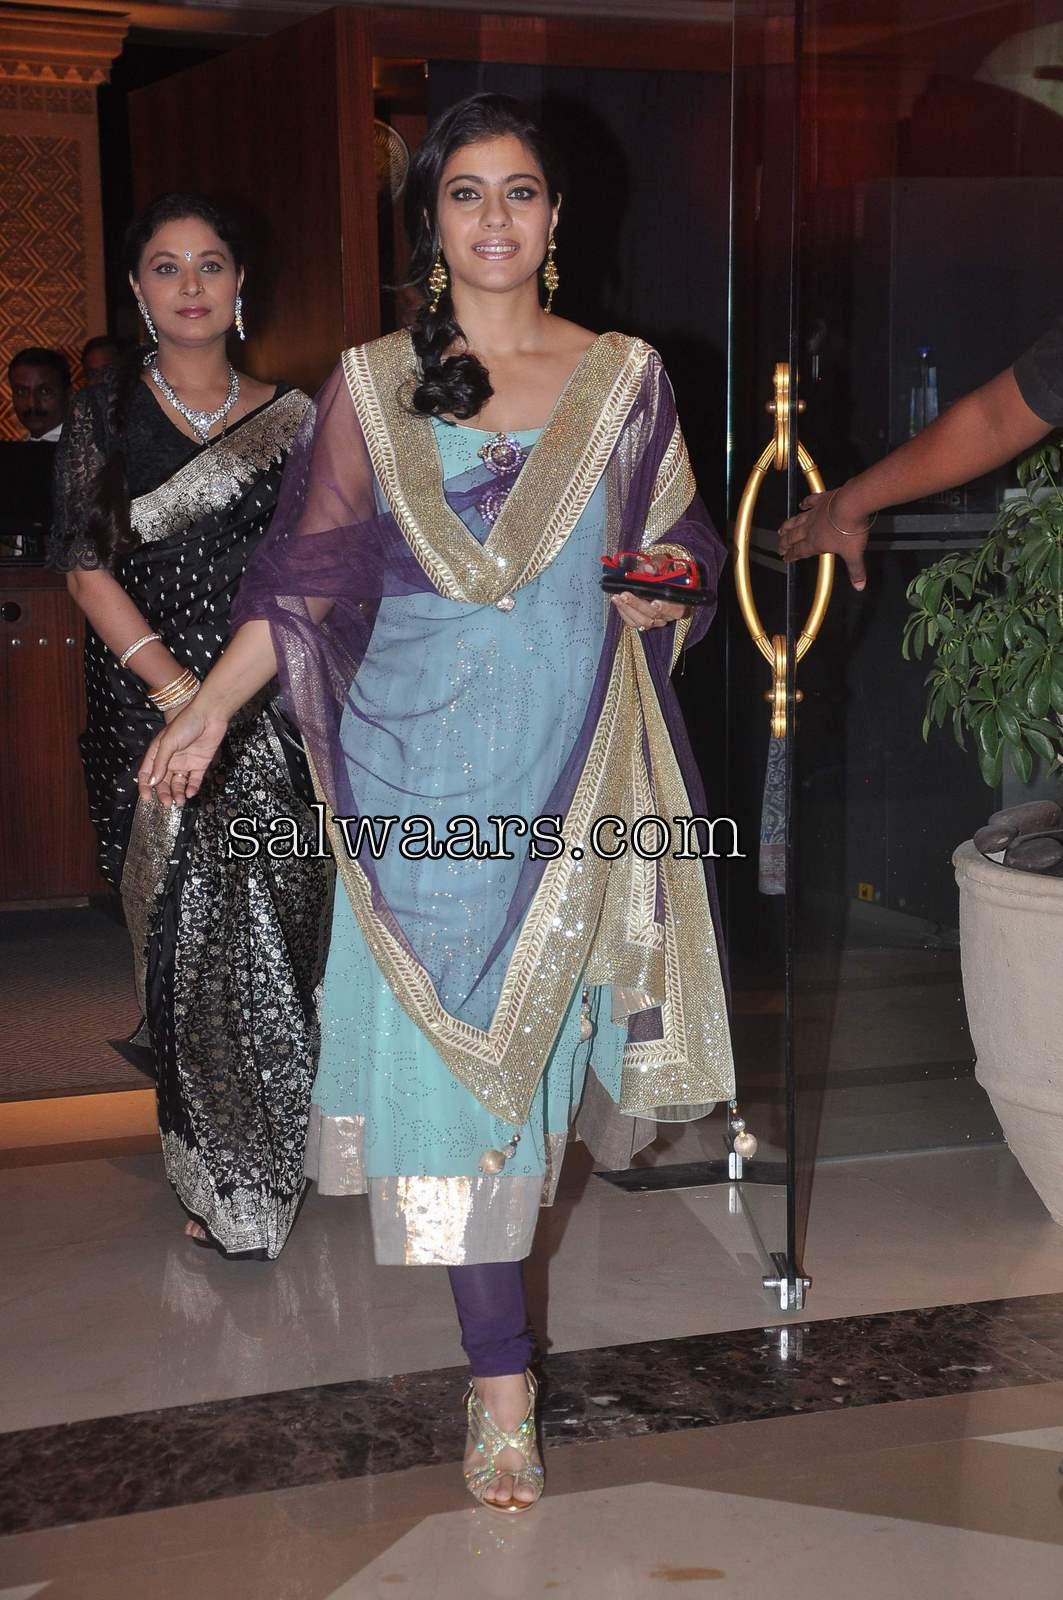 Sonam Kapoor in Sarees, Salwar Kameez, Anarkali, Dresses ...